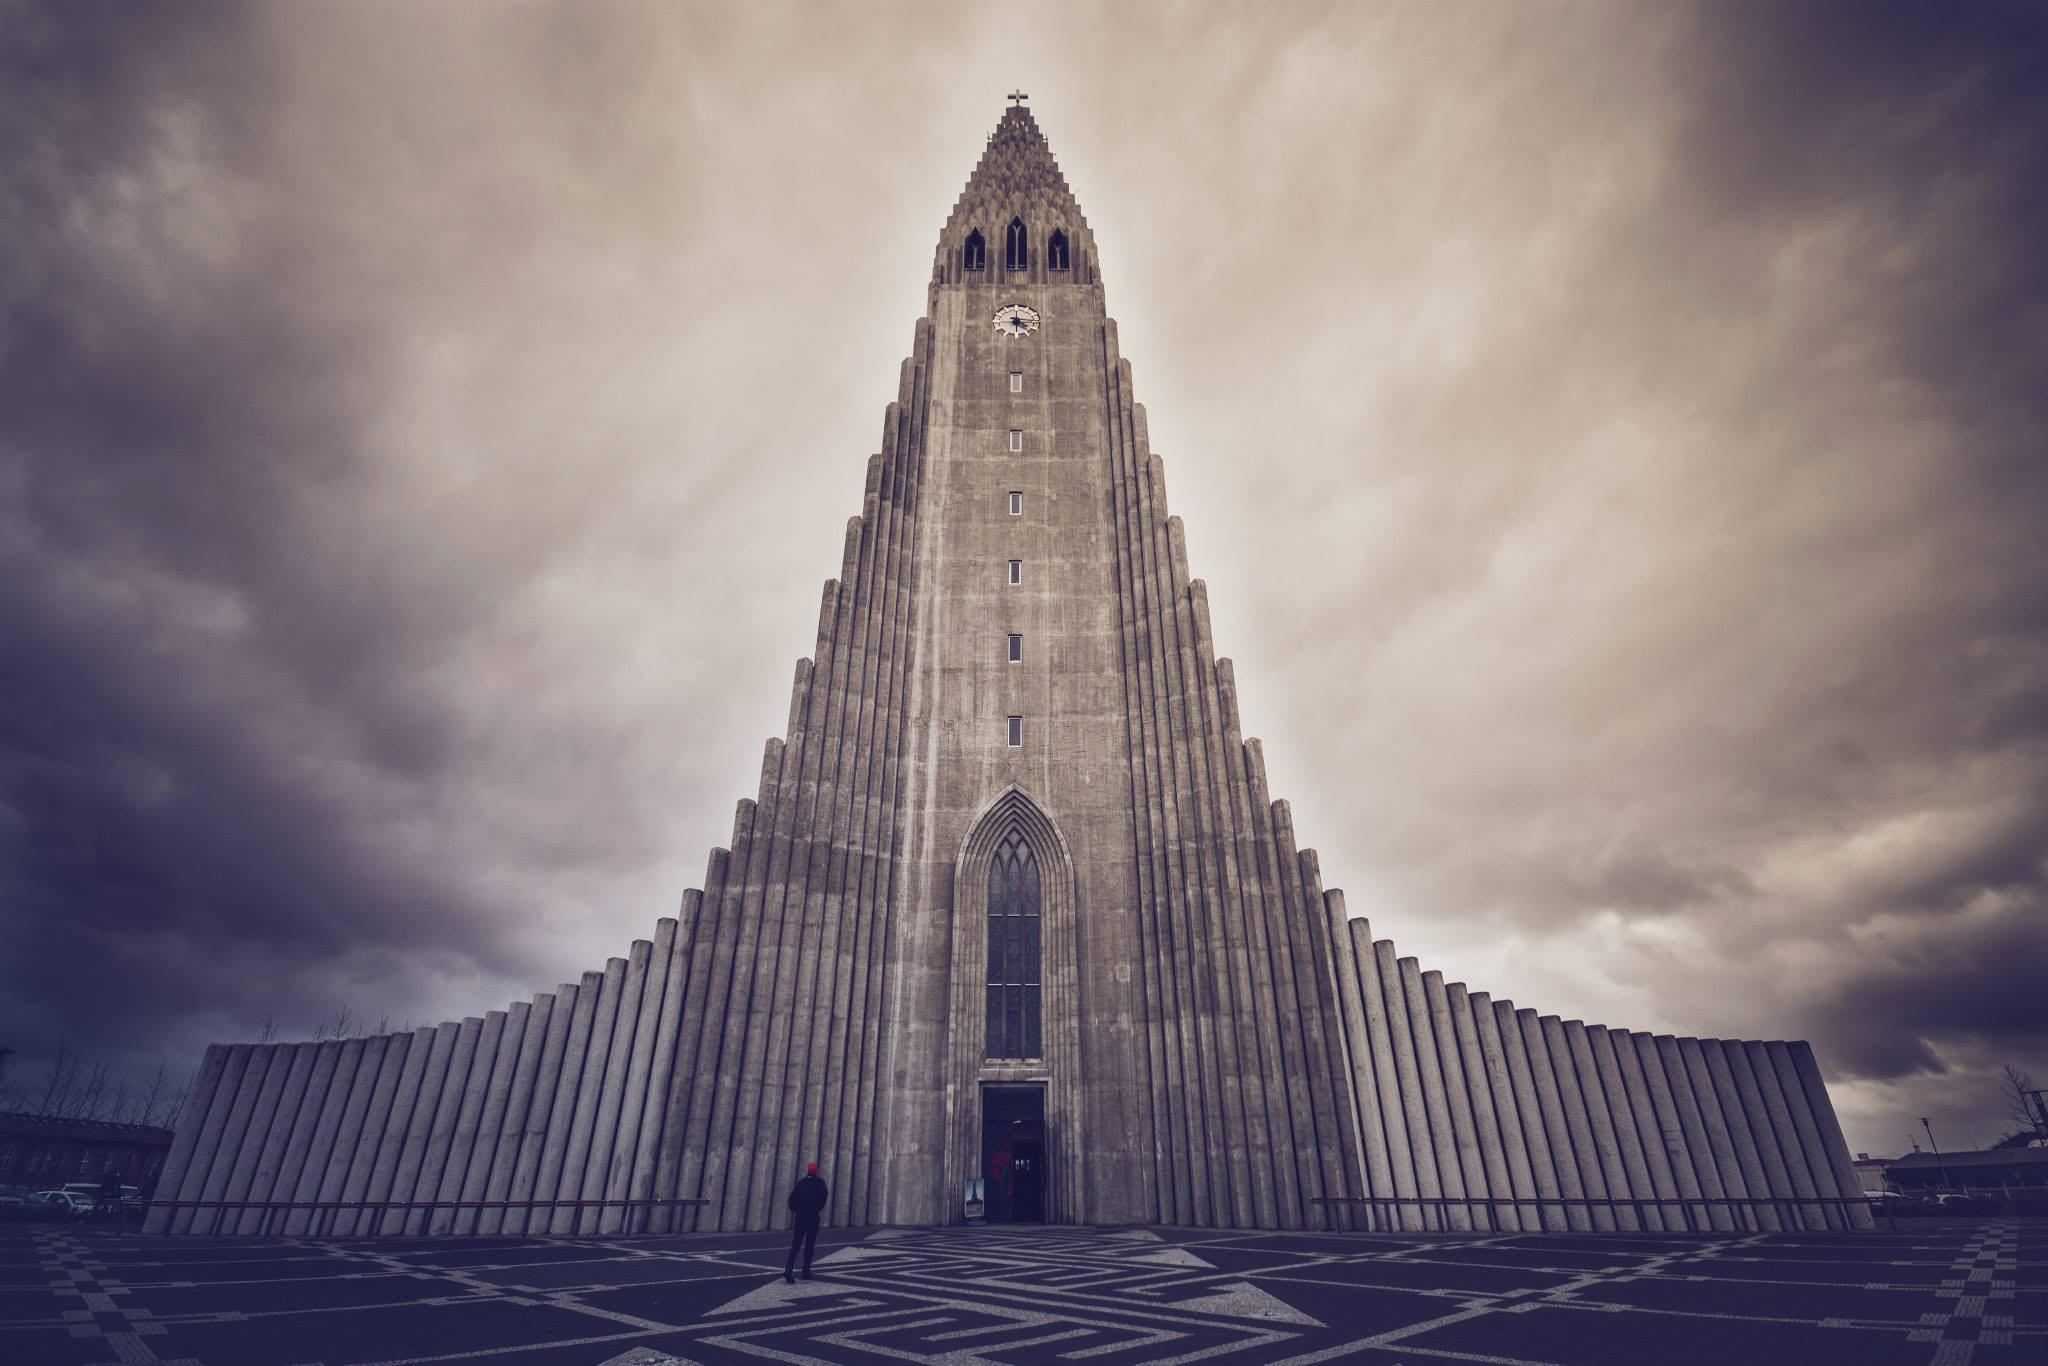 Church of Hallgrimur, Iceland